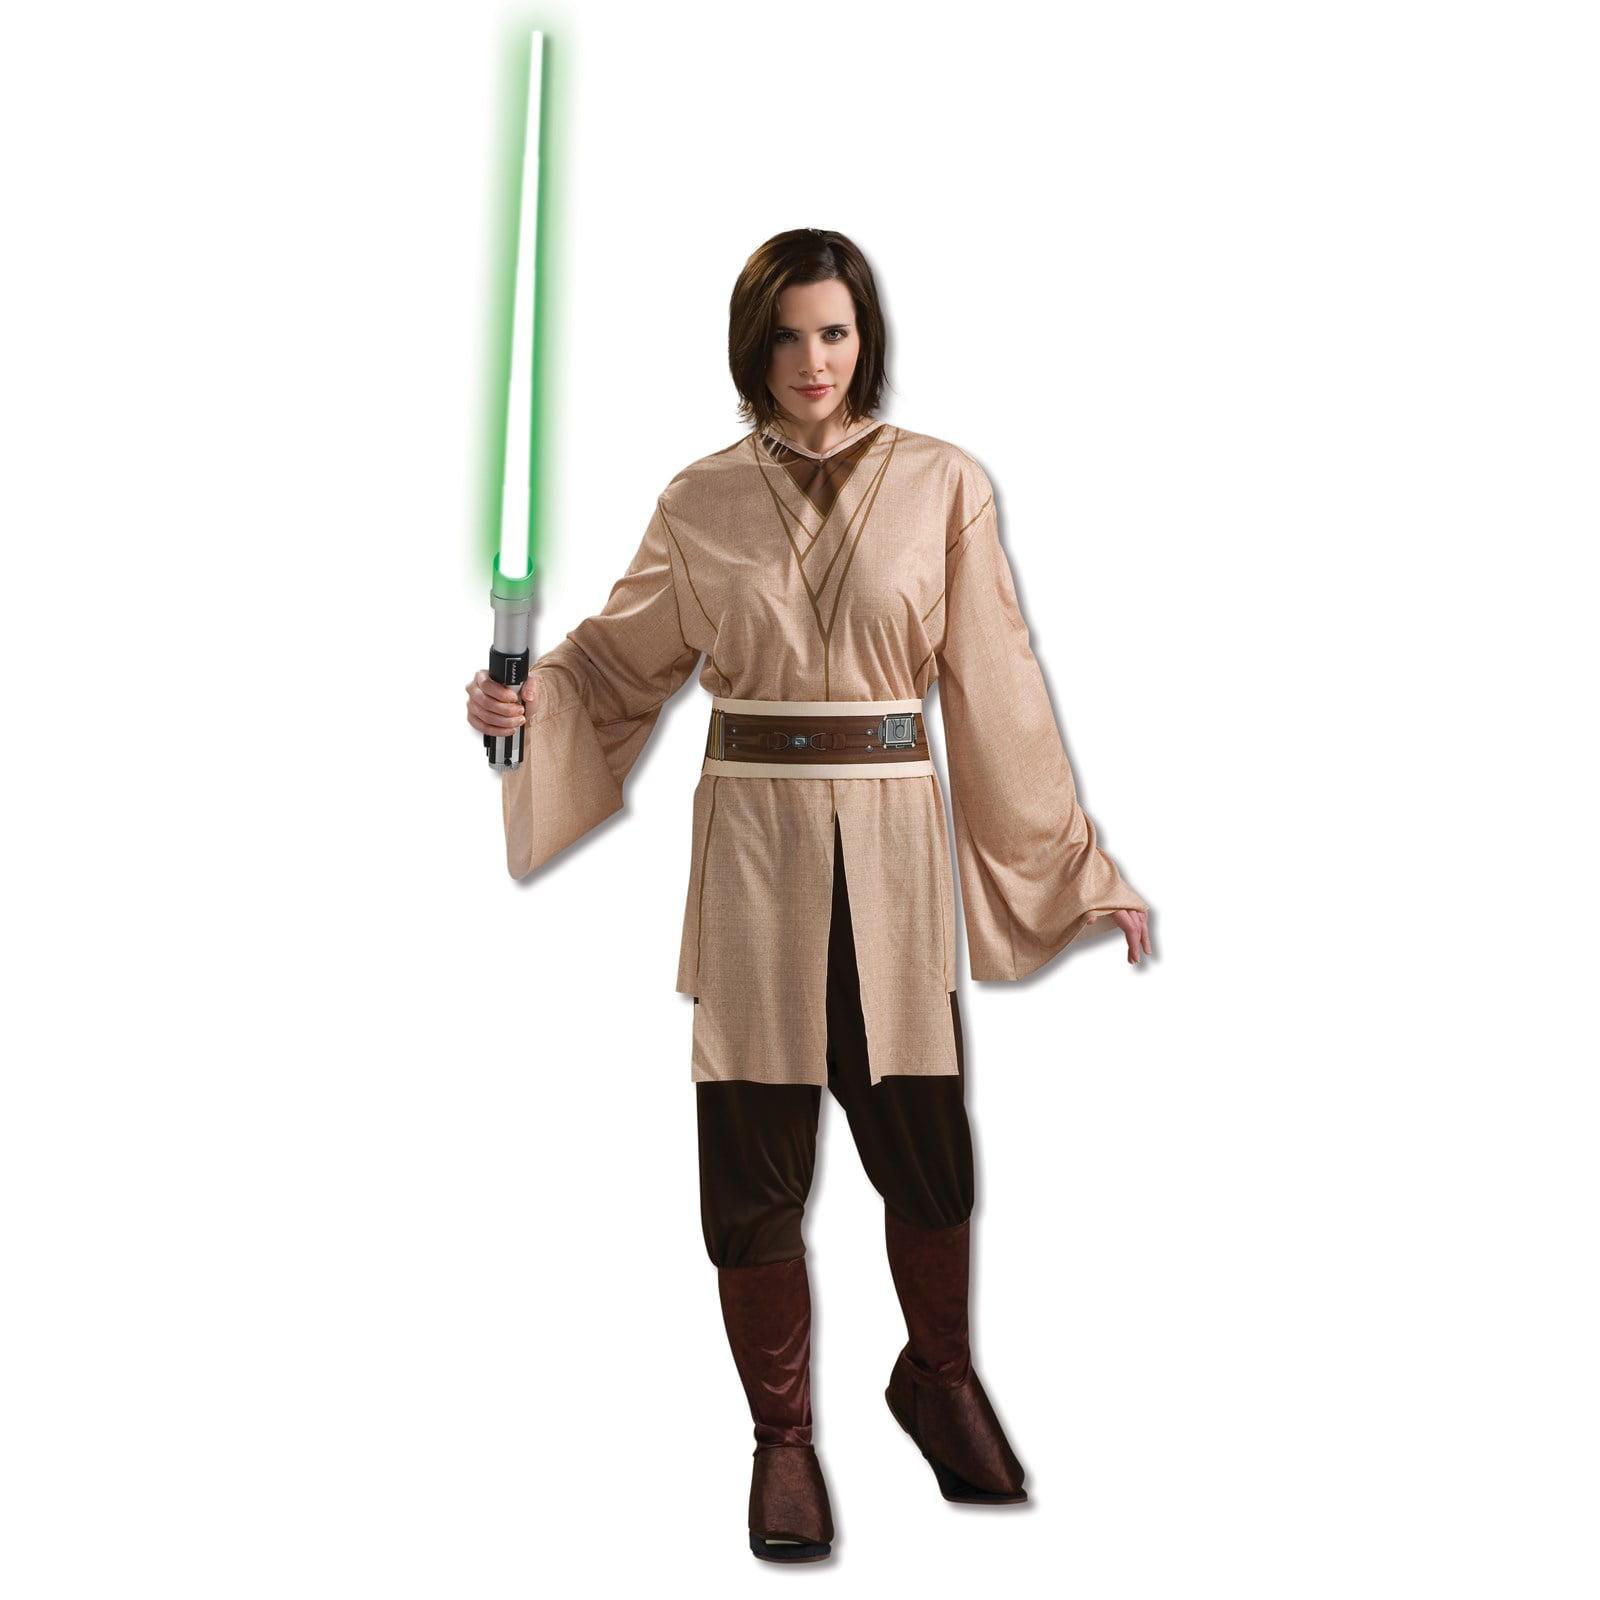 Women's Jedi Knight Costume